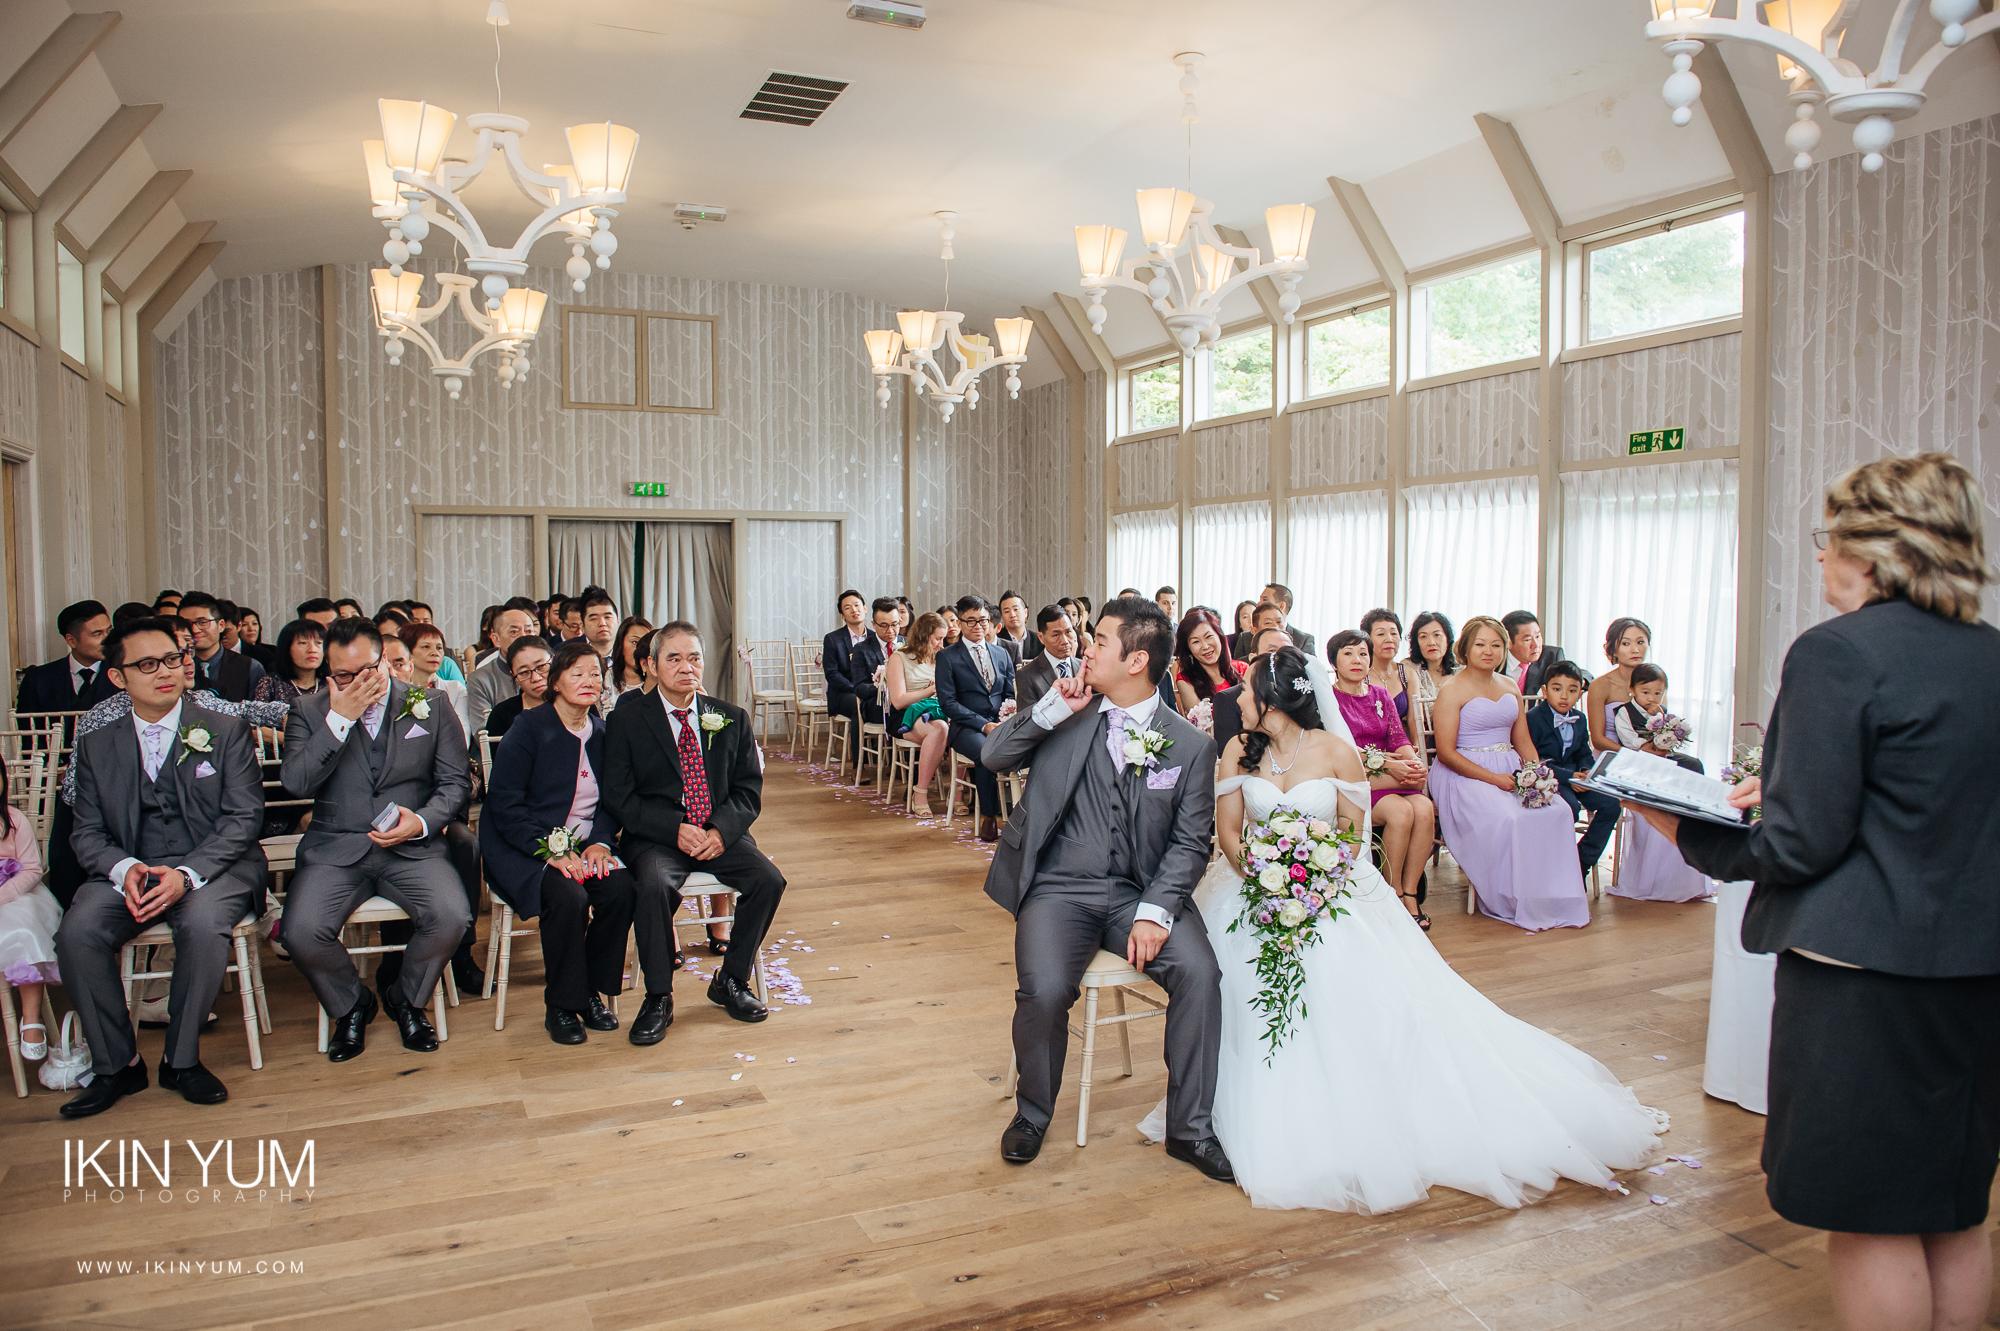 Hampton Manor Wedding - Ikin Yum Photography -074.jpg